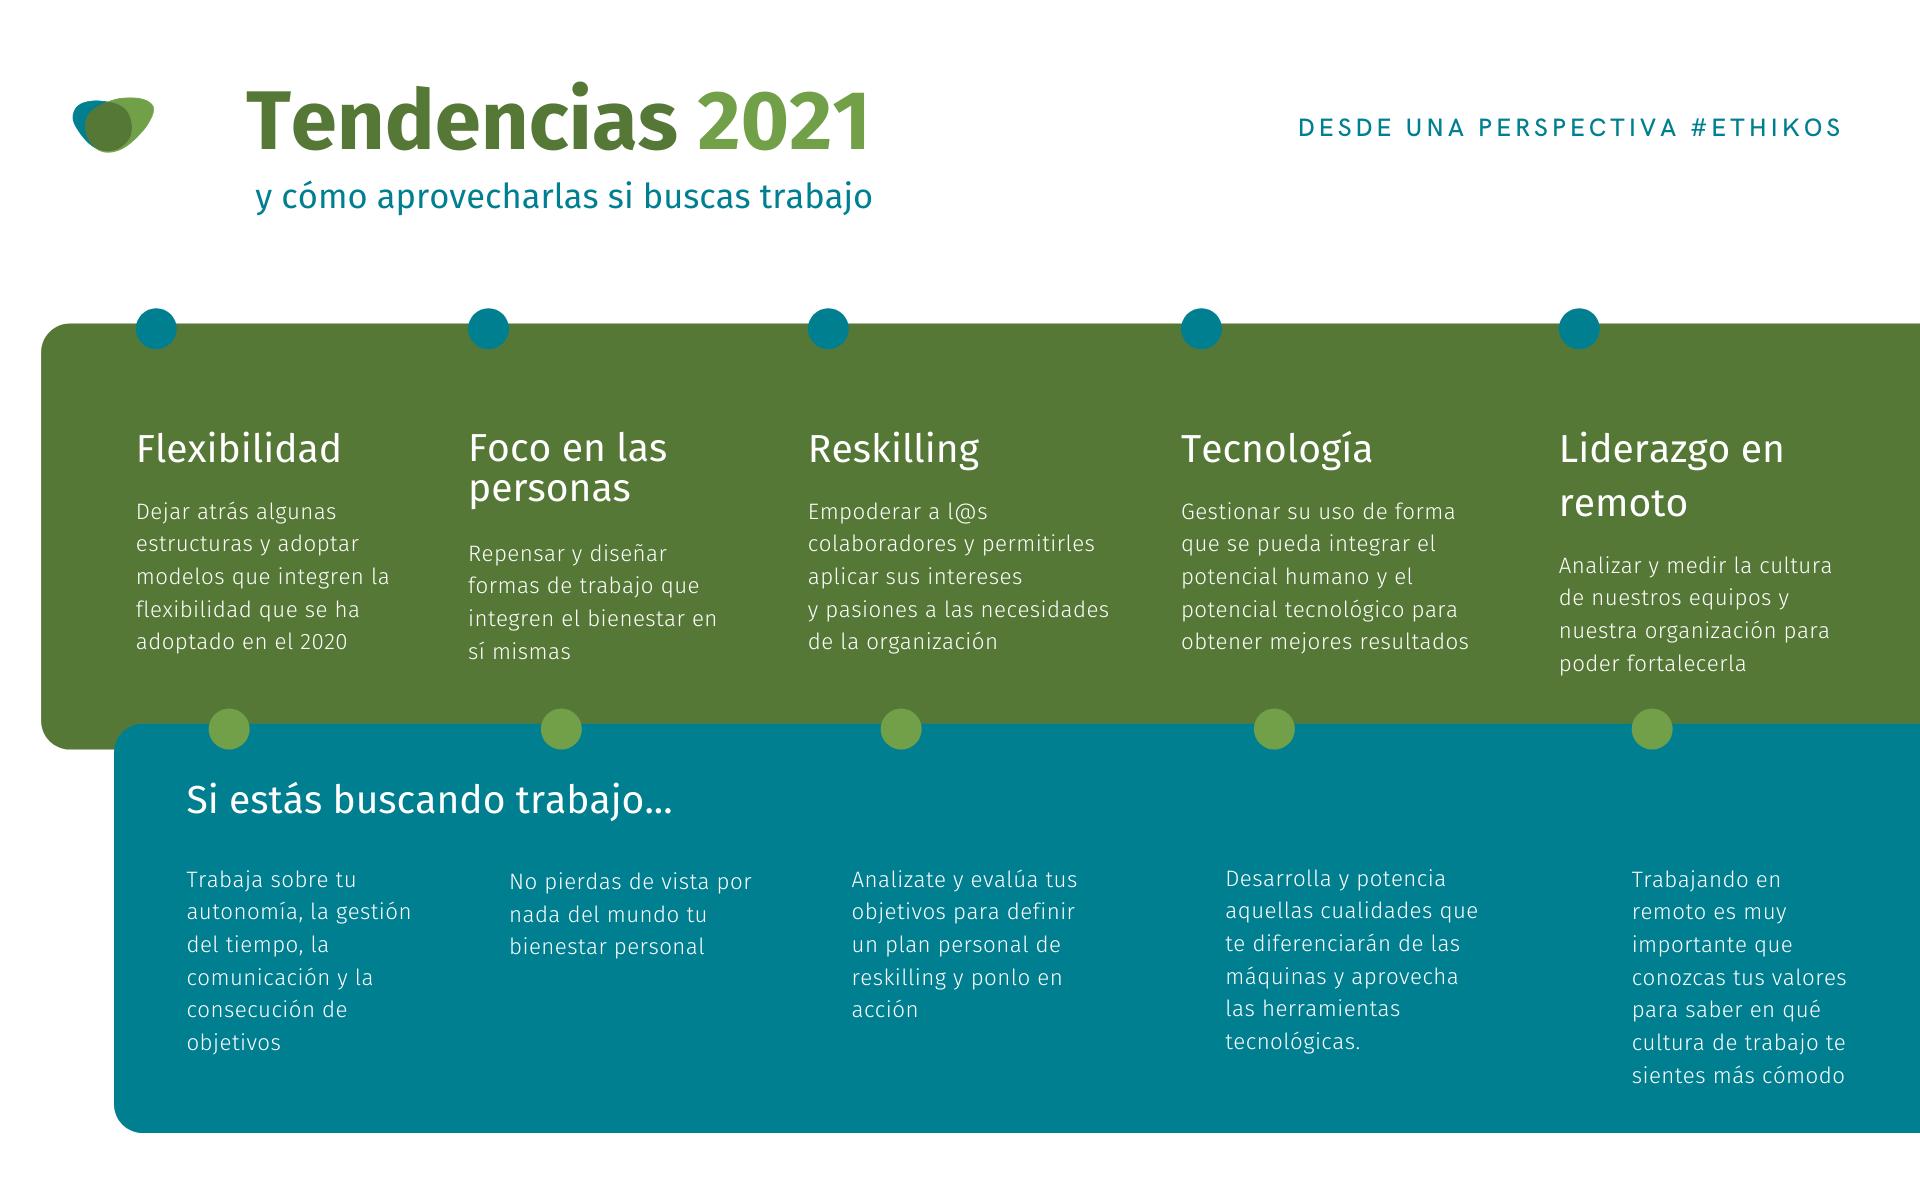 Tendencias 2021 recursos humanos